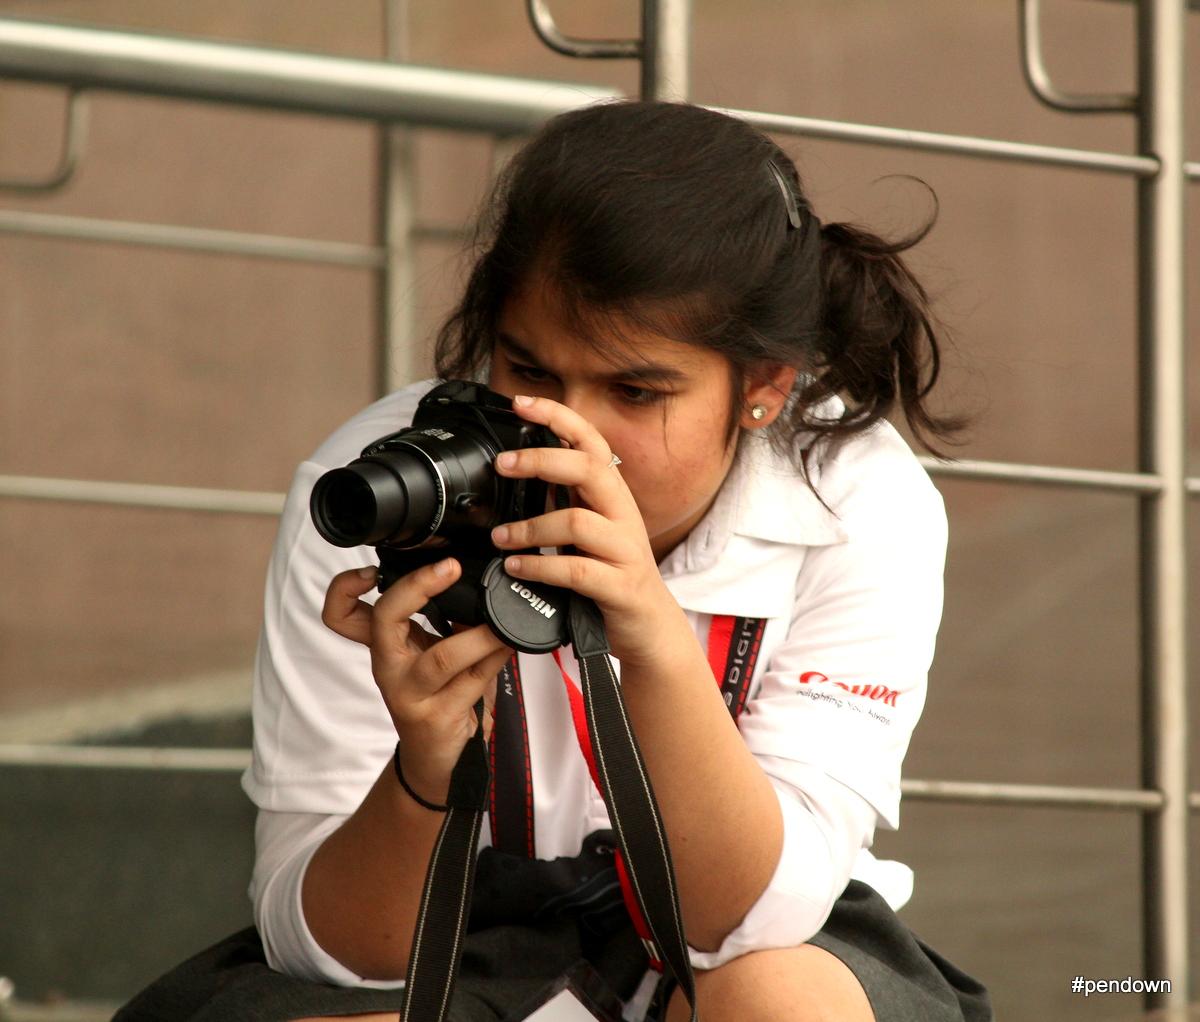 Photography is an art